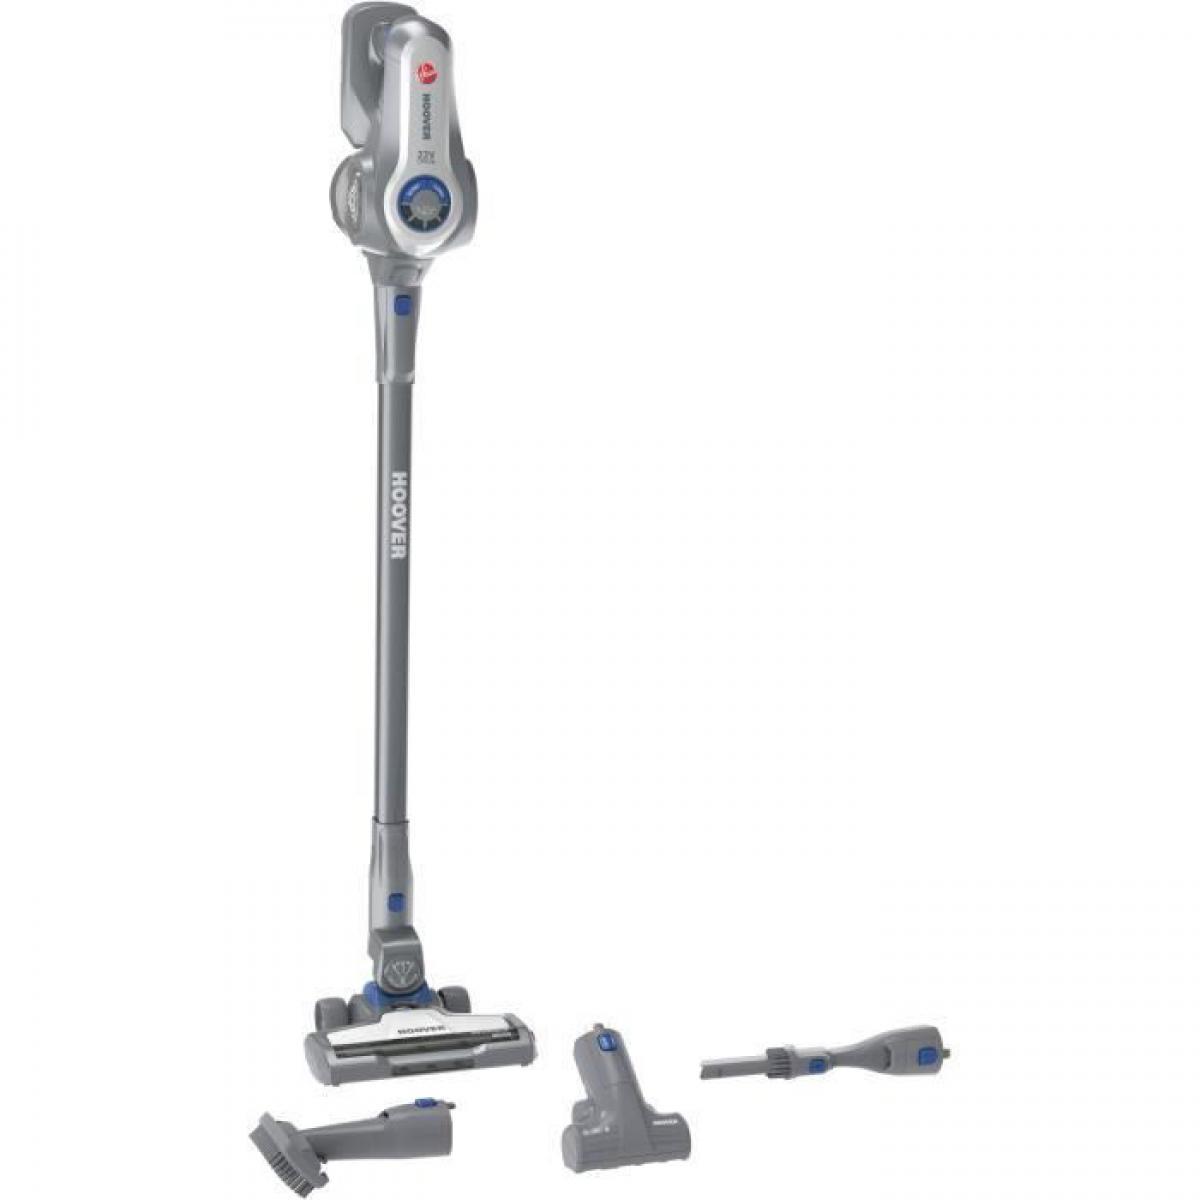 Hoover HOOVER HF722PTLG Aspirateur balai sans sac multi-fonctions - Leger et maniable - 22 V Lithium - Accessoire special anima